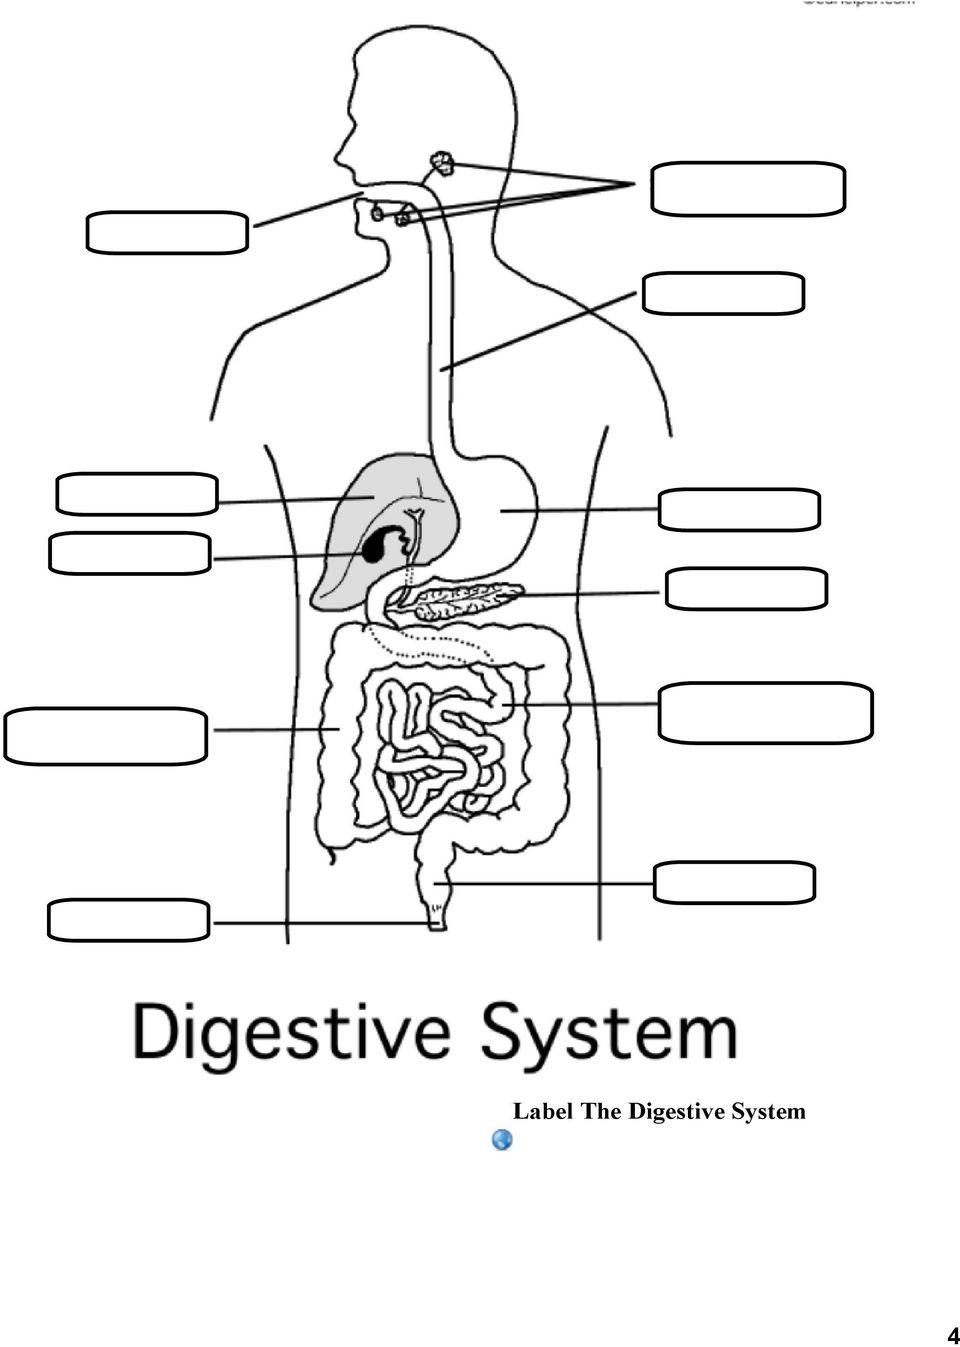 medium resolution of Magic School Bus Digestive System Brainpop Digestive System - PDF Free  Download